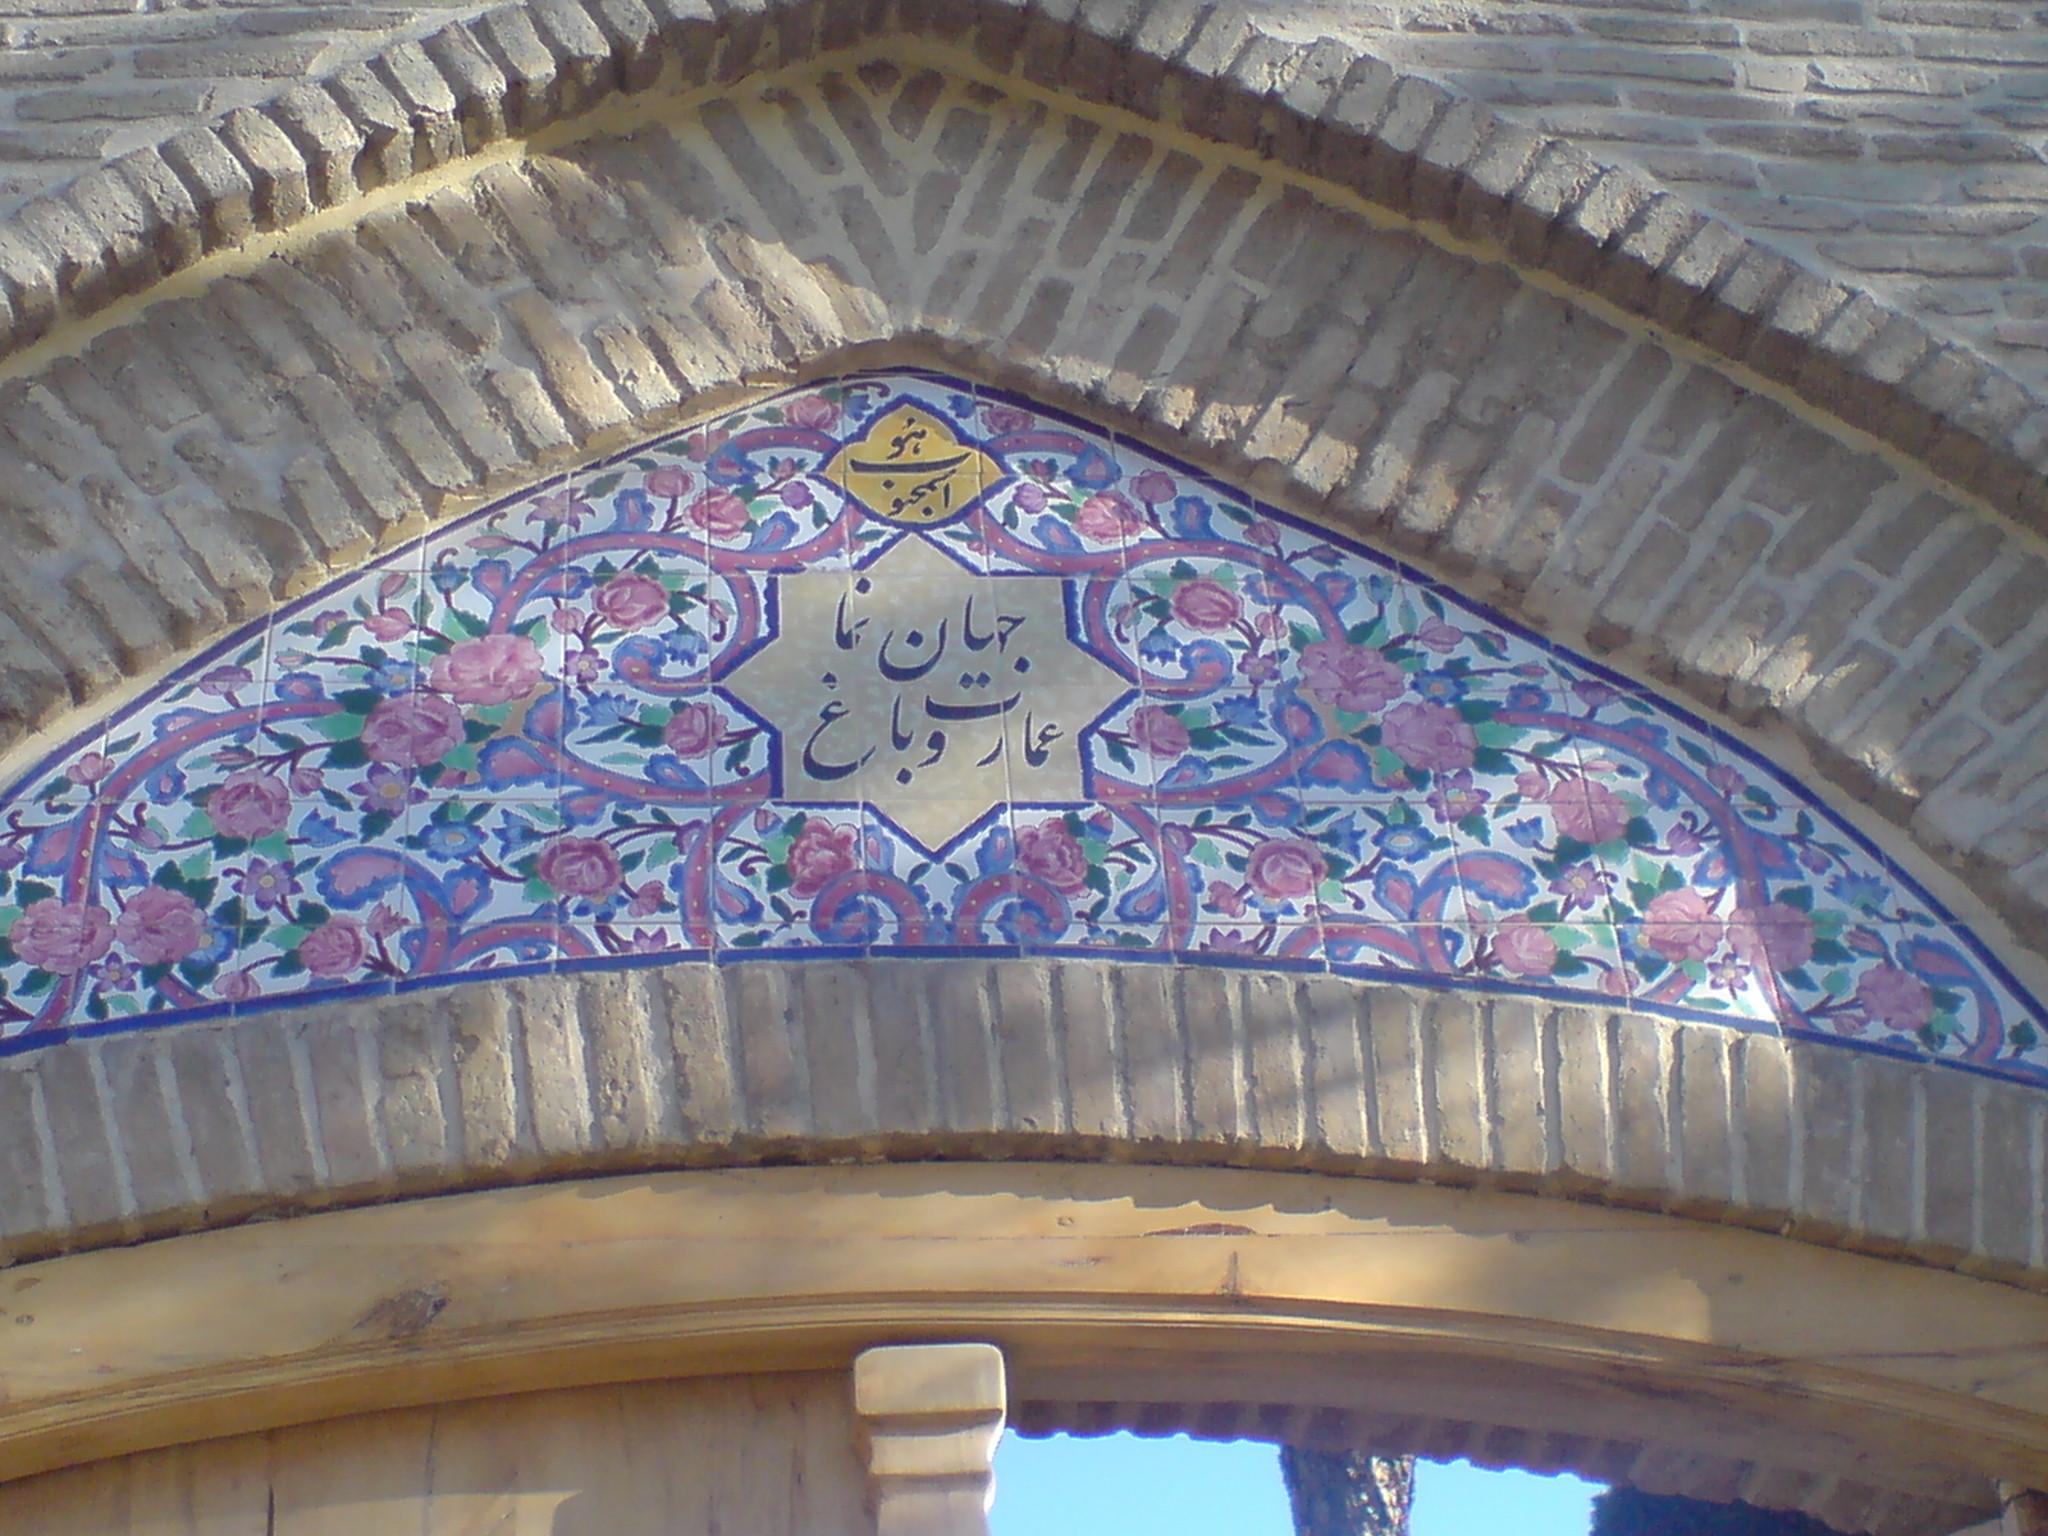 shiraz fars iran butifull city شیراز فارس ایران شهر سوم مذهبی پایتخت فرهنگی ایران اردیبهشت زیبا اردی بهشت سرزمین مادری ام  سردر ورودی باغ جهان نما